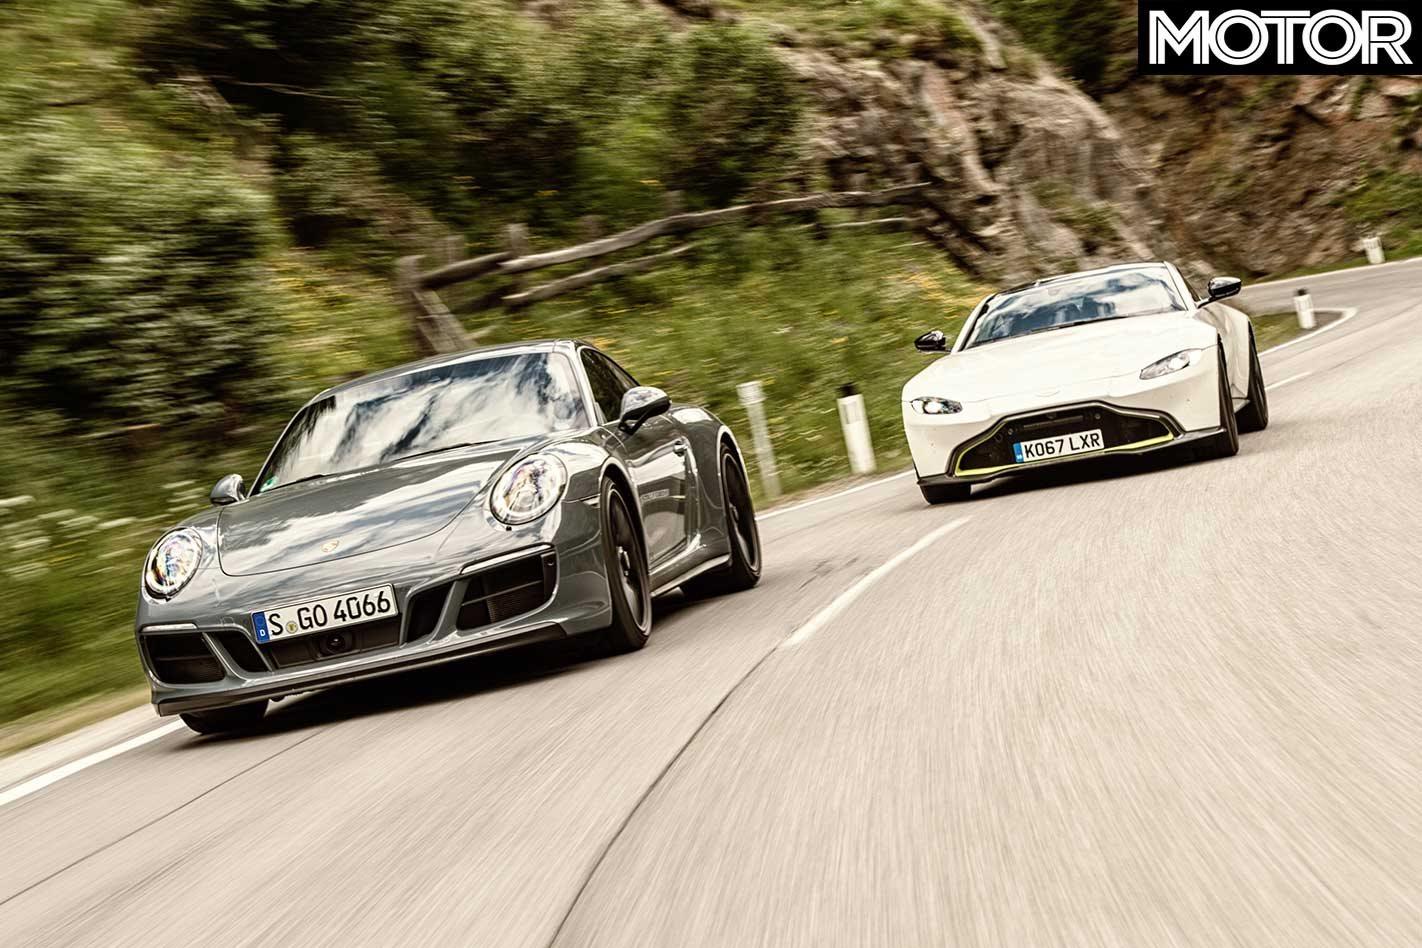 2018 Aston Martin Vantage Vs Porsche 911 Carrera 4 Gts Vs Mercedes Amg Gt C Performance Comparison Review